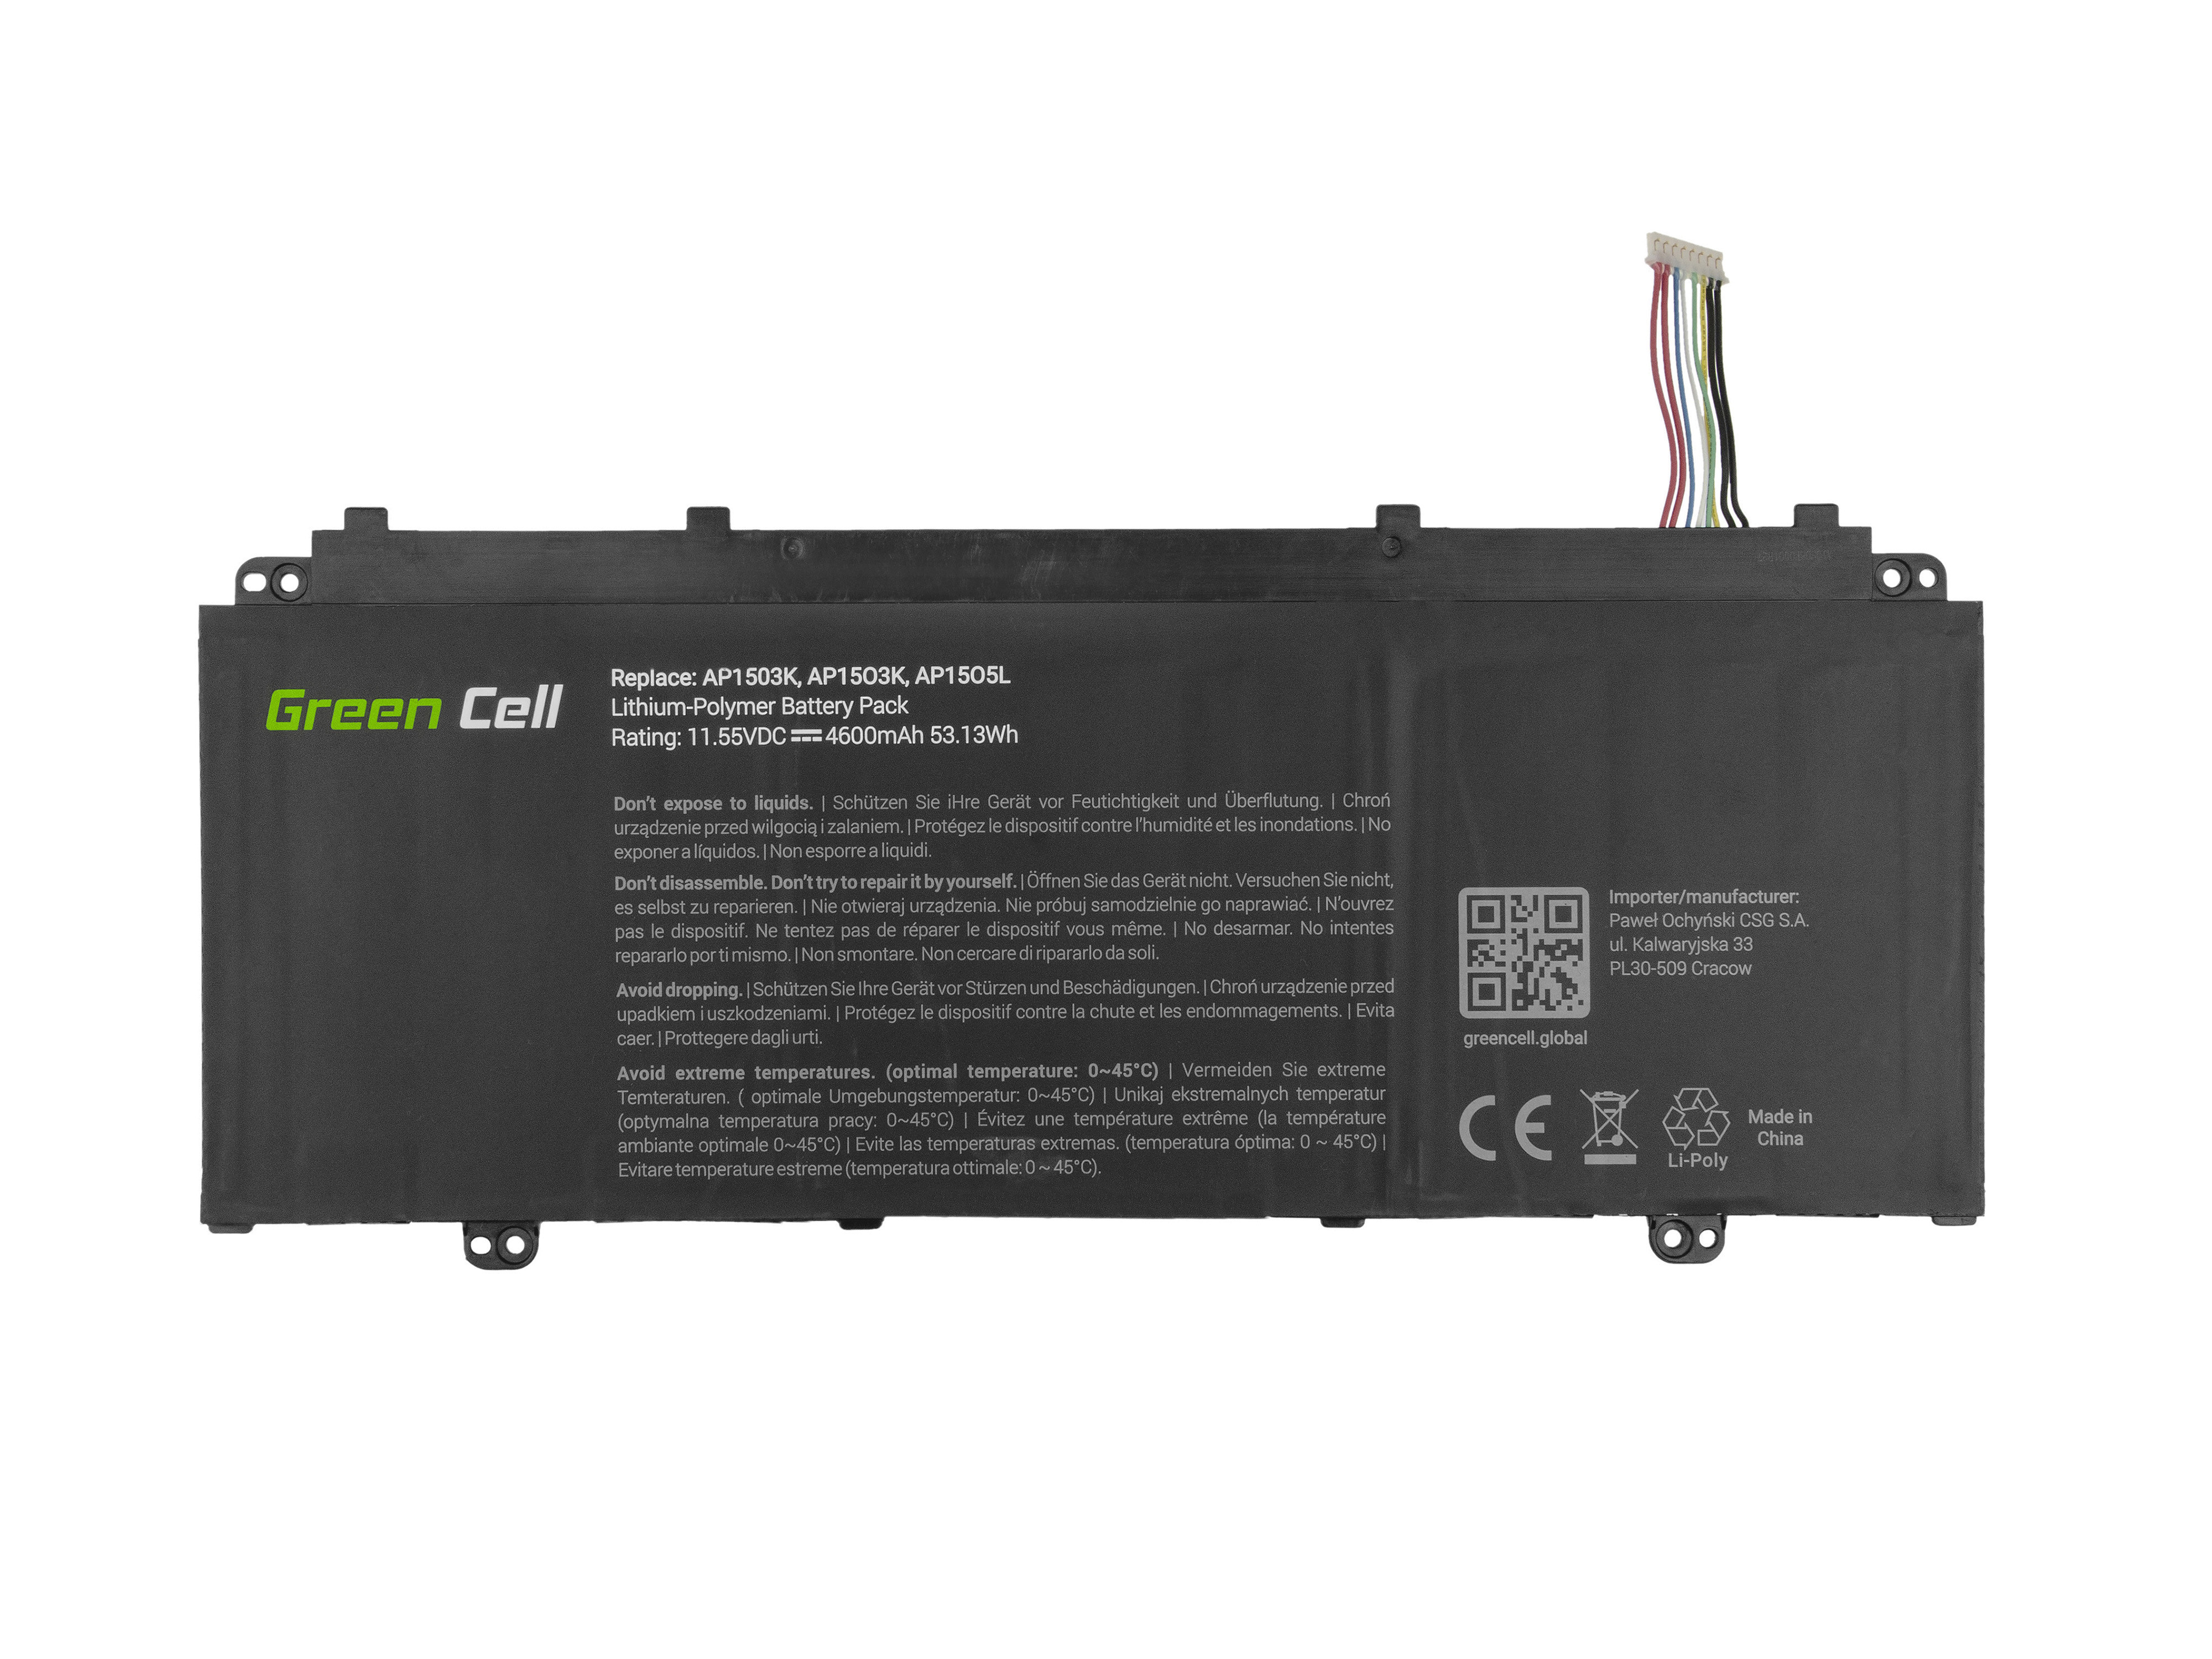 Green Cell AC56 Baterie Acer AP1503K/AP1505L/AP15O3K/AP15O5L/Aspire S13/Swift 5 4600mAh Li-Pol – neoriginální